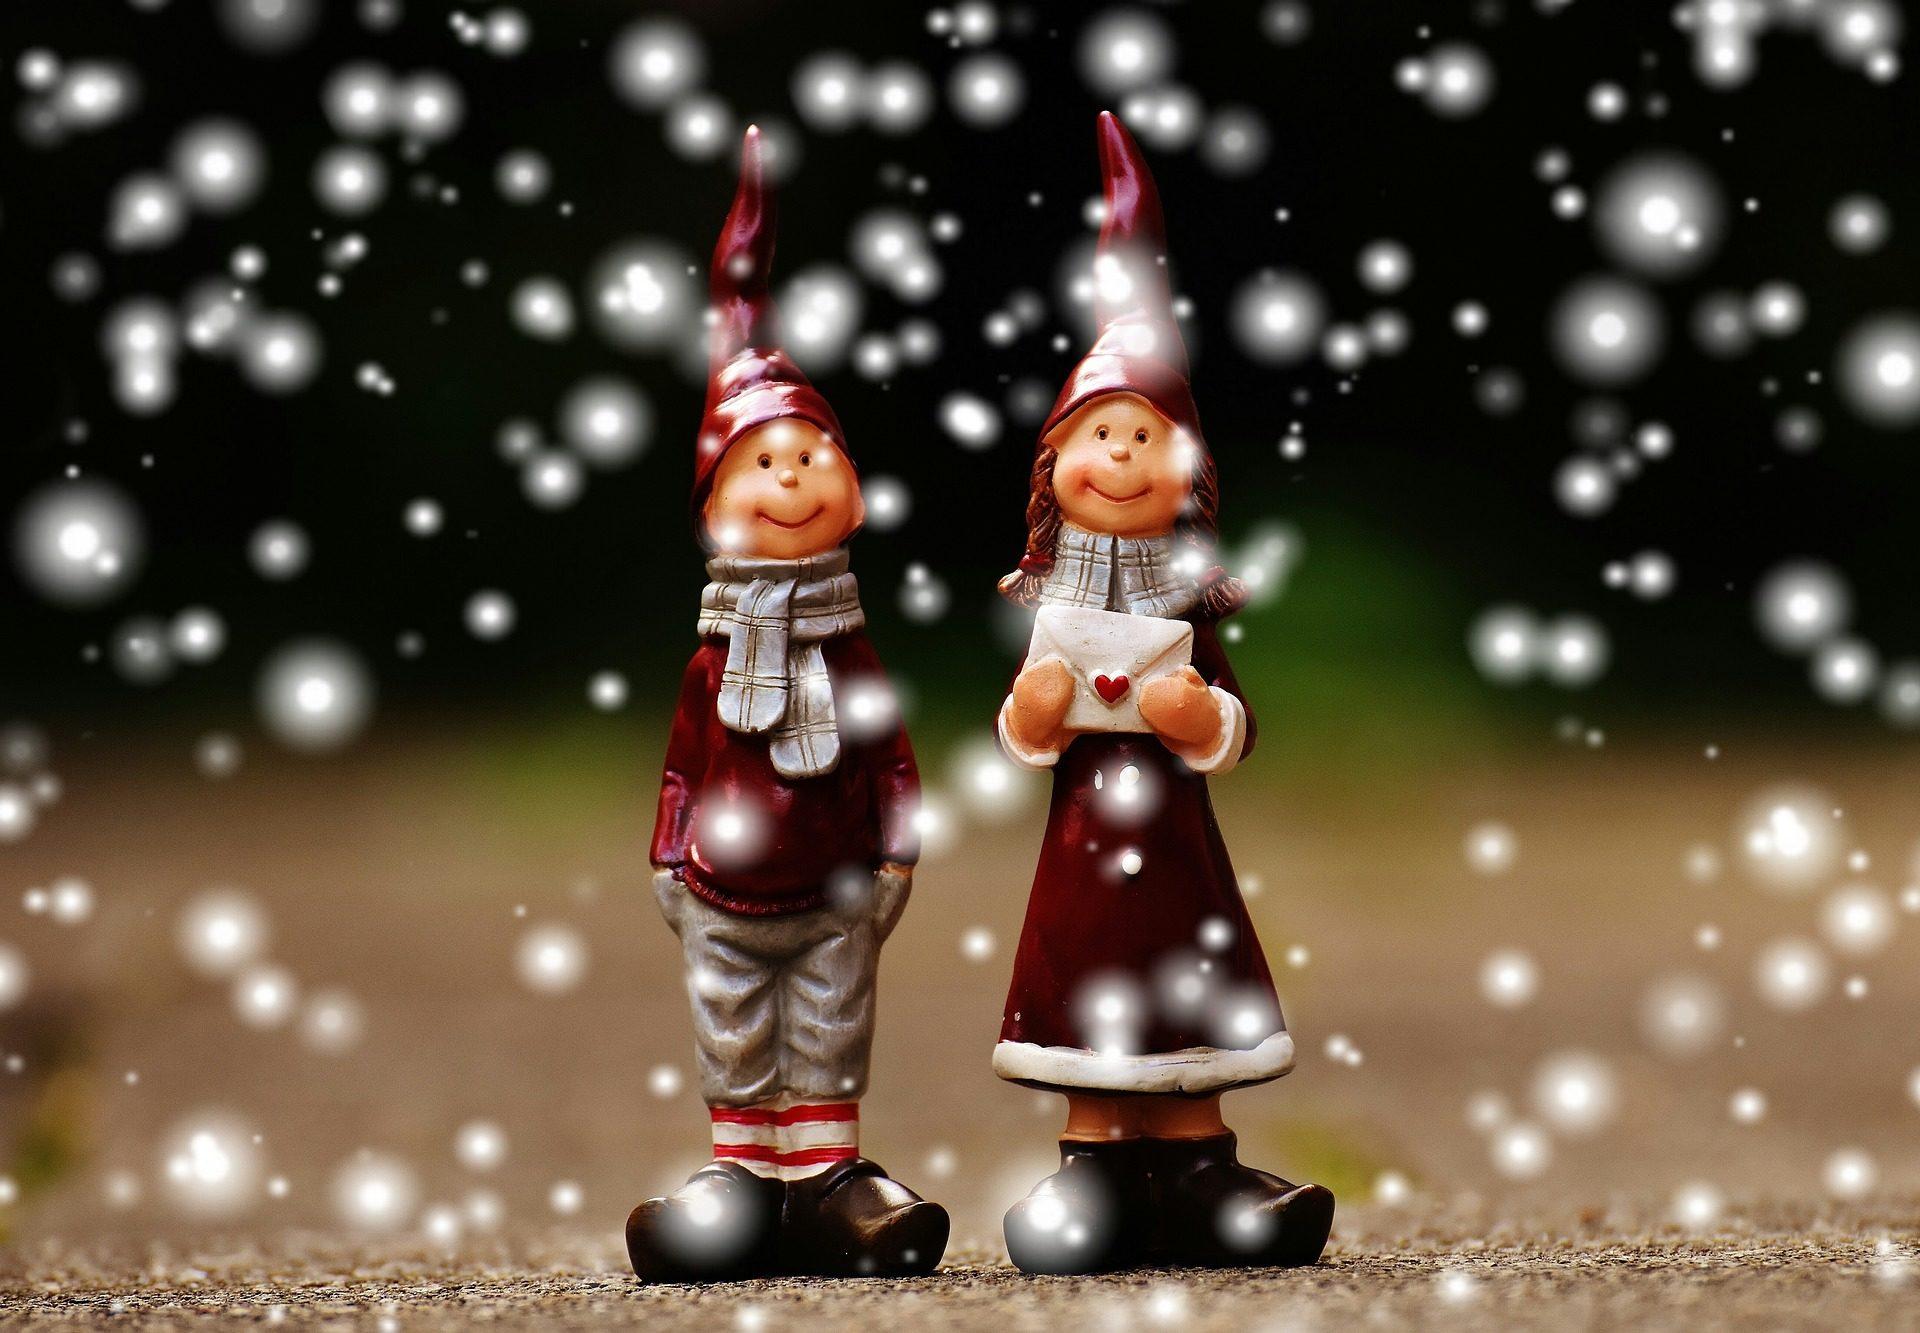 Zahlen, duentes, Schnee, Brief, paar, Weihnachten - Wallpaper HD - Prof.-falken.com